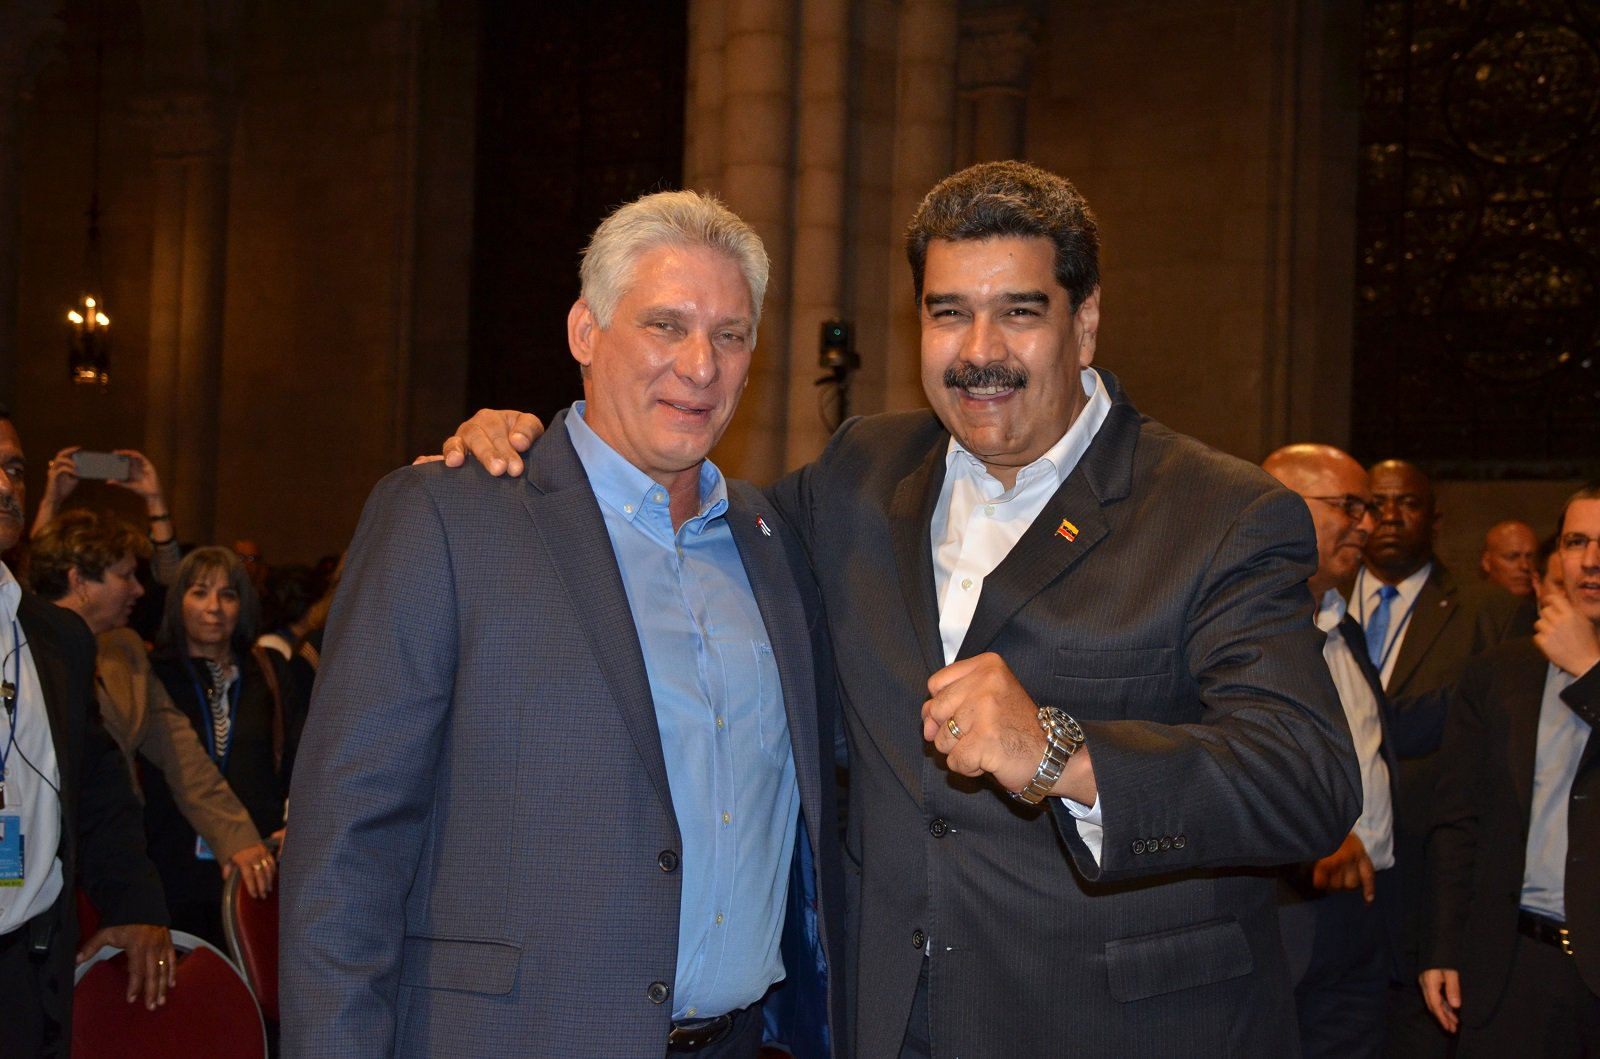 Diaz-Canel-and-Maduro-26-9-18.jpg